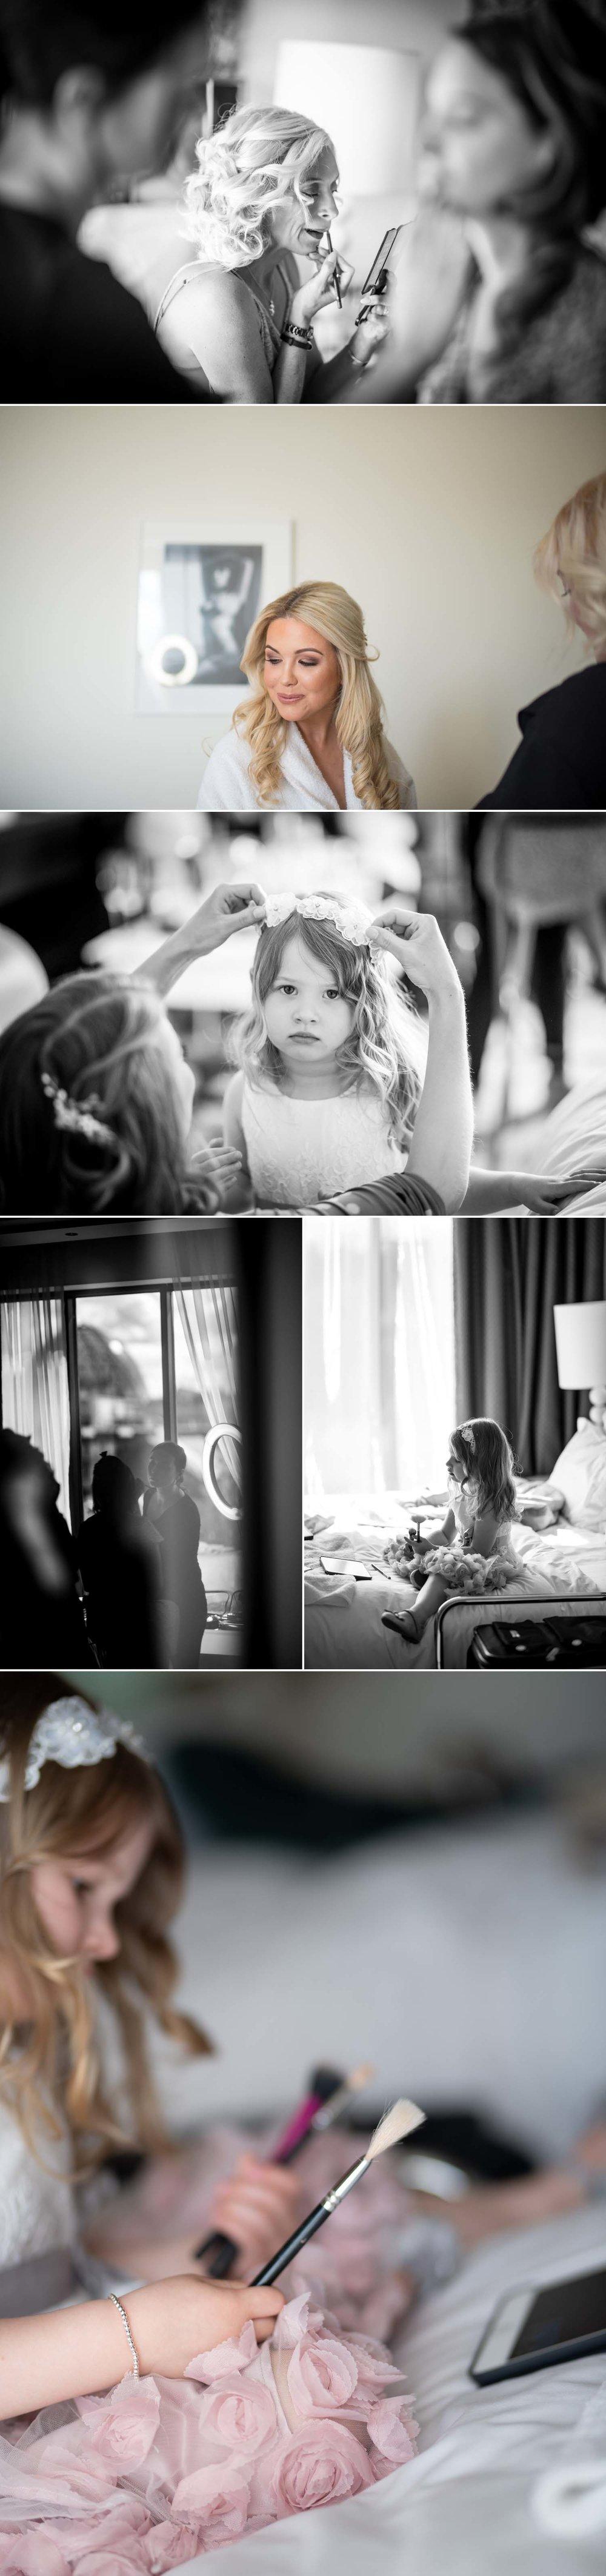 Merchant Hotel Belfast Wedding Photography James McGrillis 03.jpg